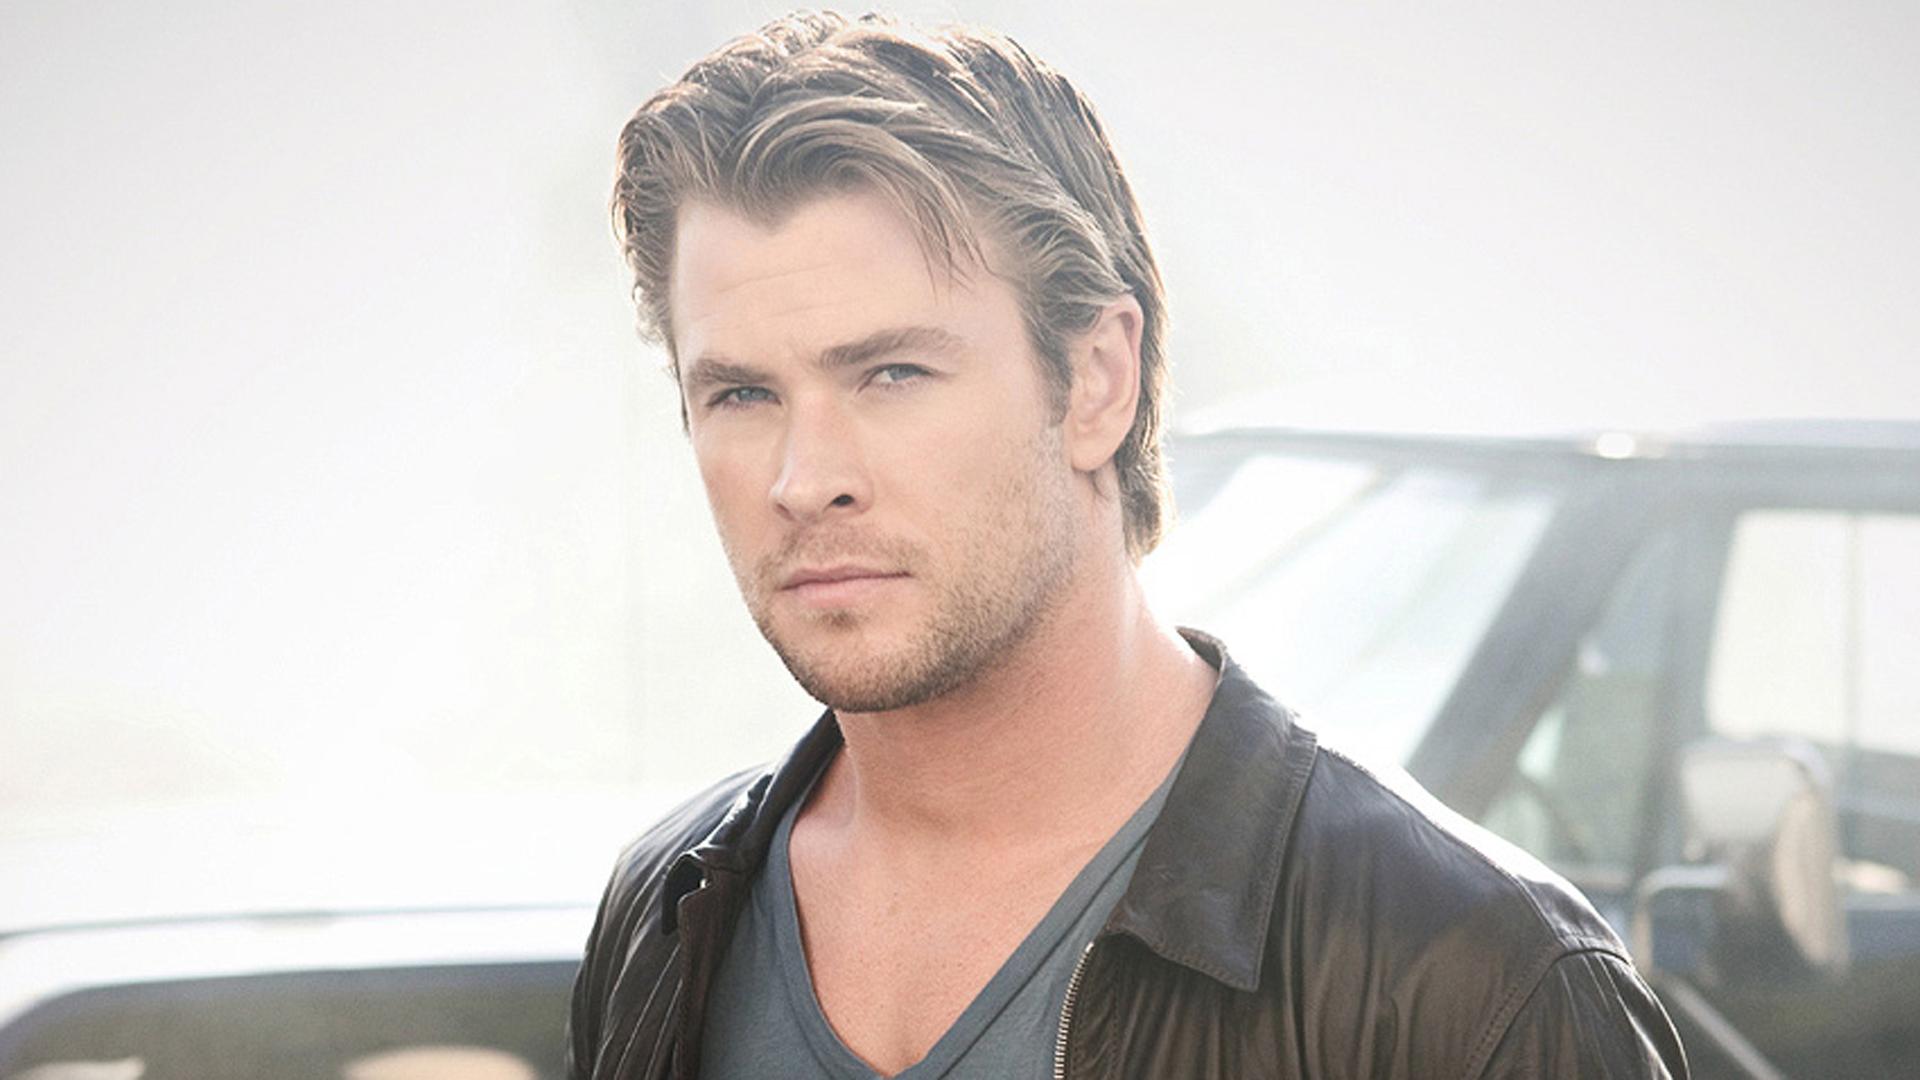 Chris Hemsworth Chris Hemsworth Wallpaper 30822817 Fanpop 1920x1080